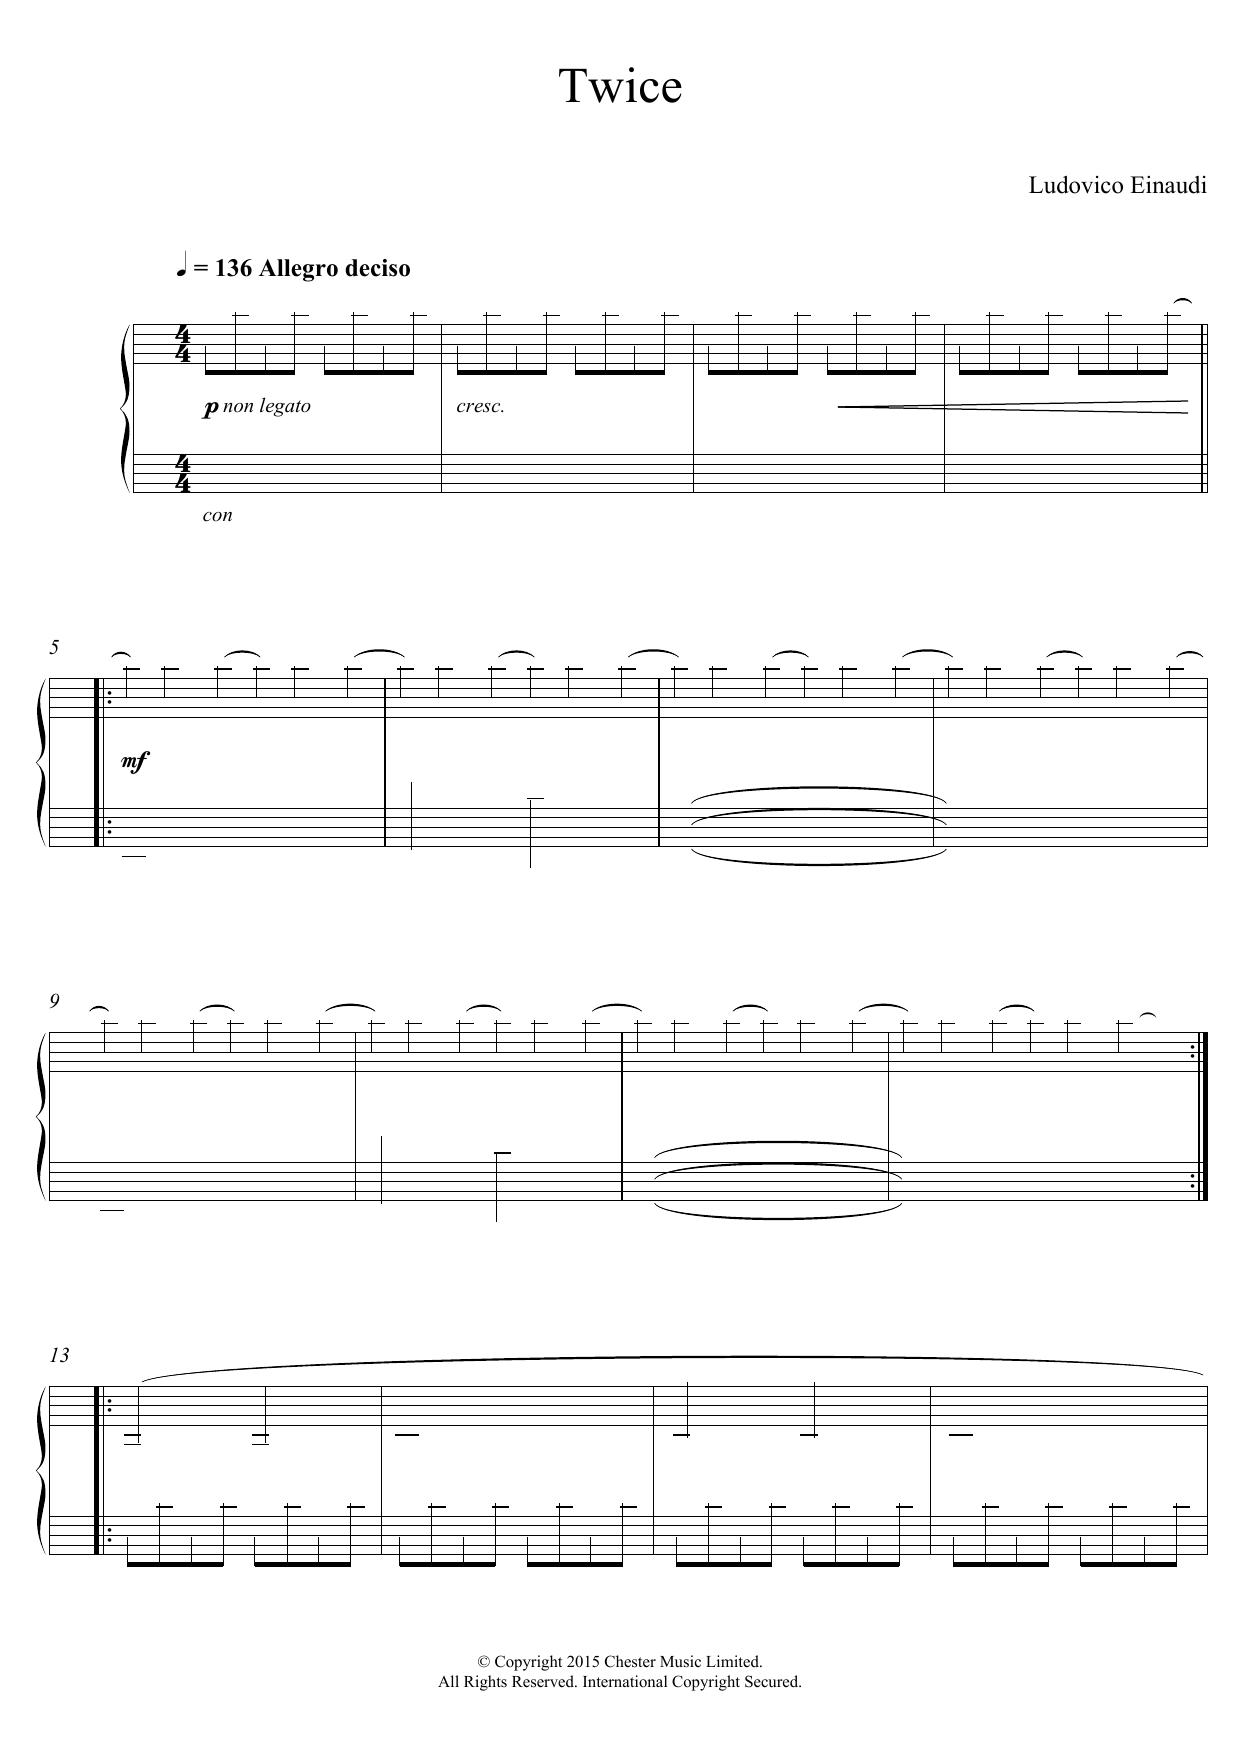 Twice Sheet Music